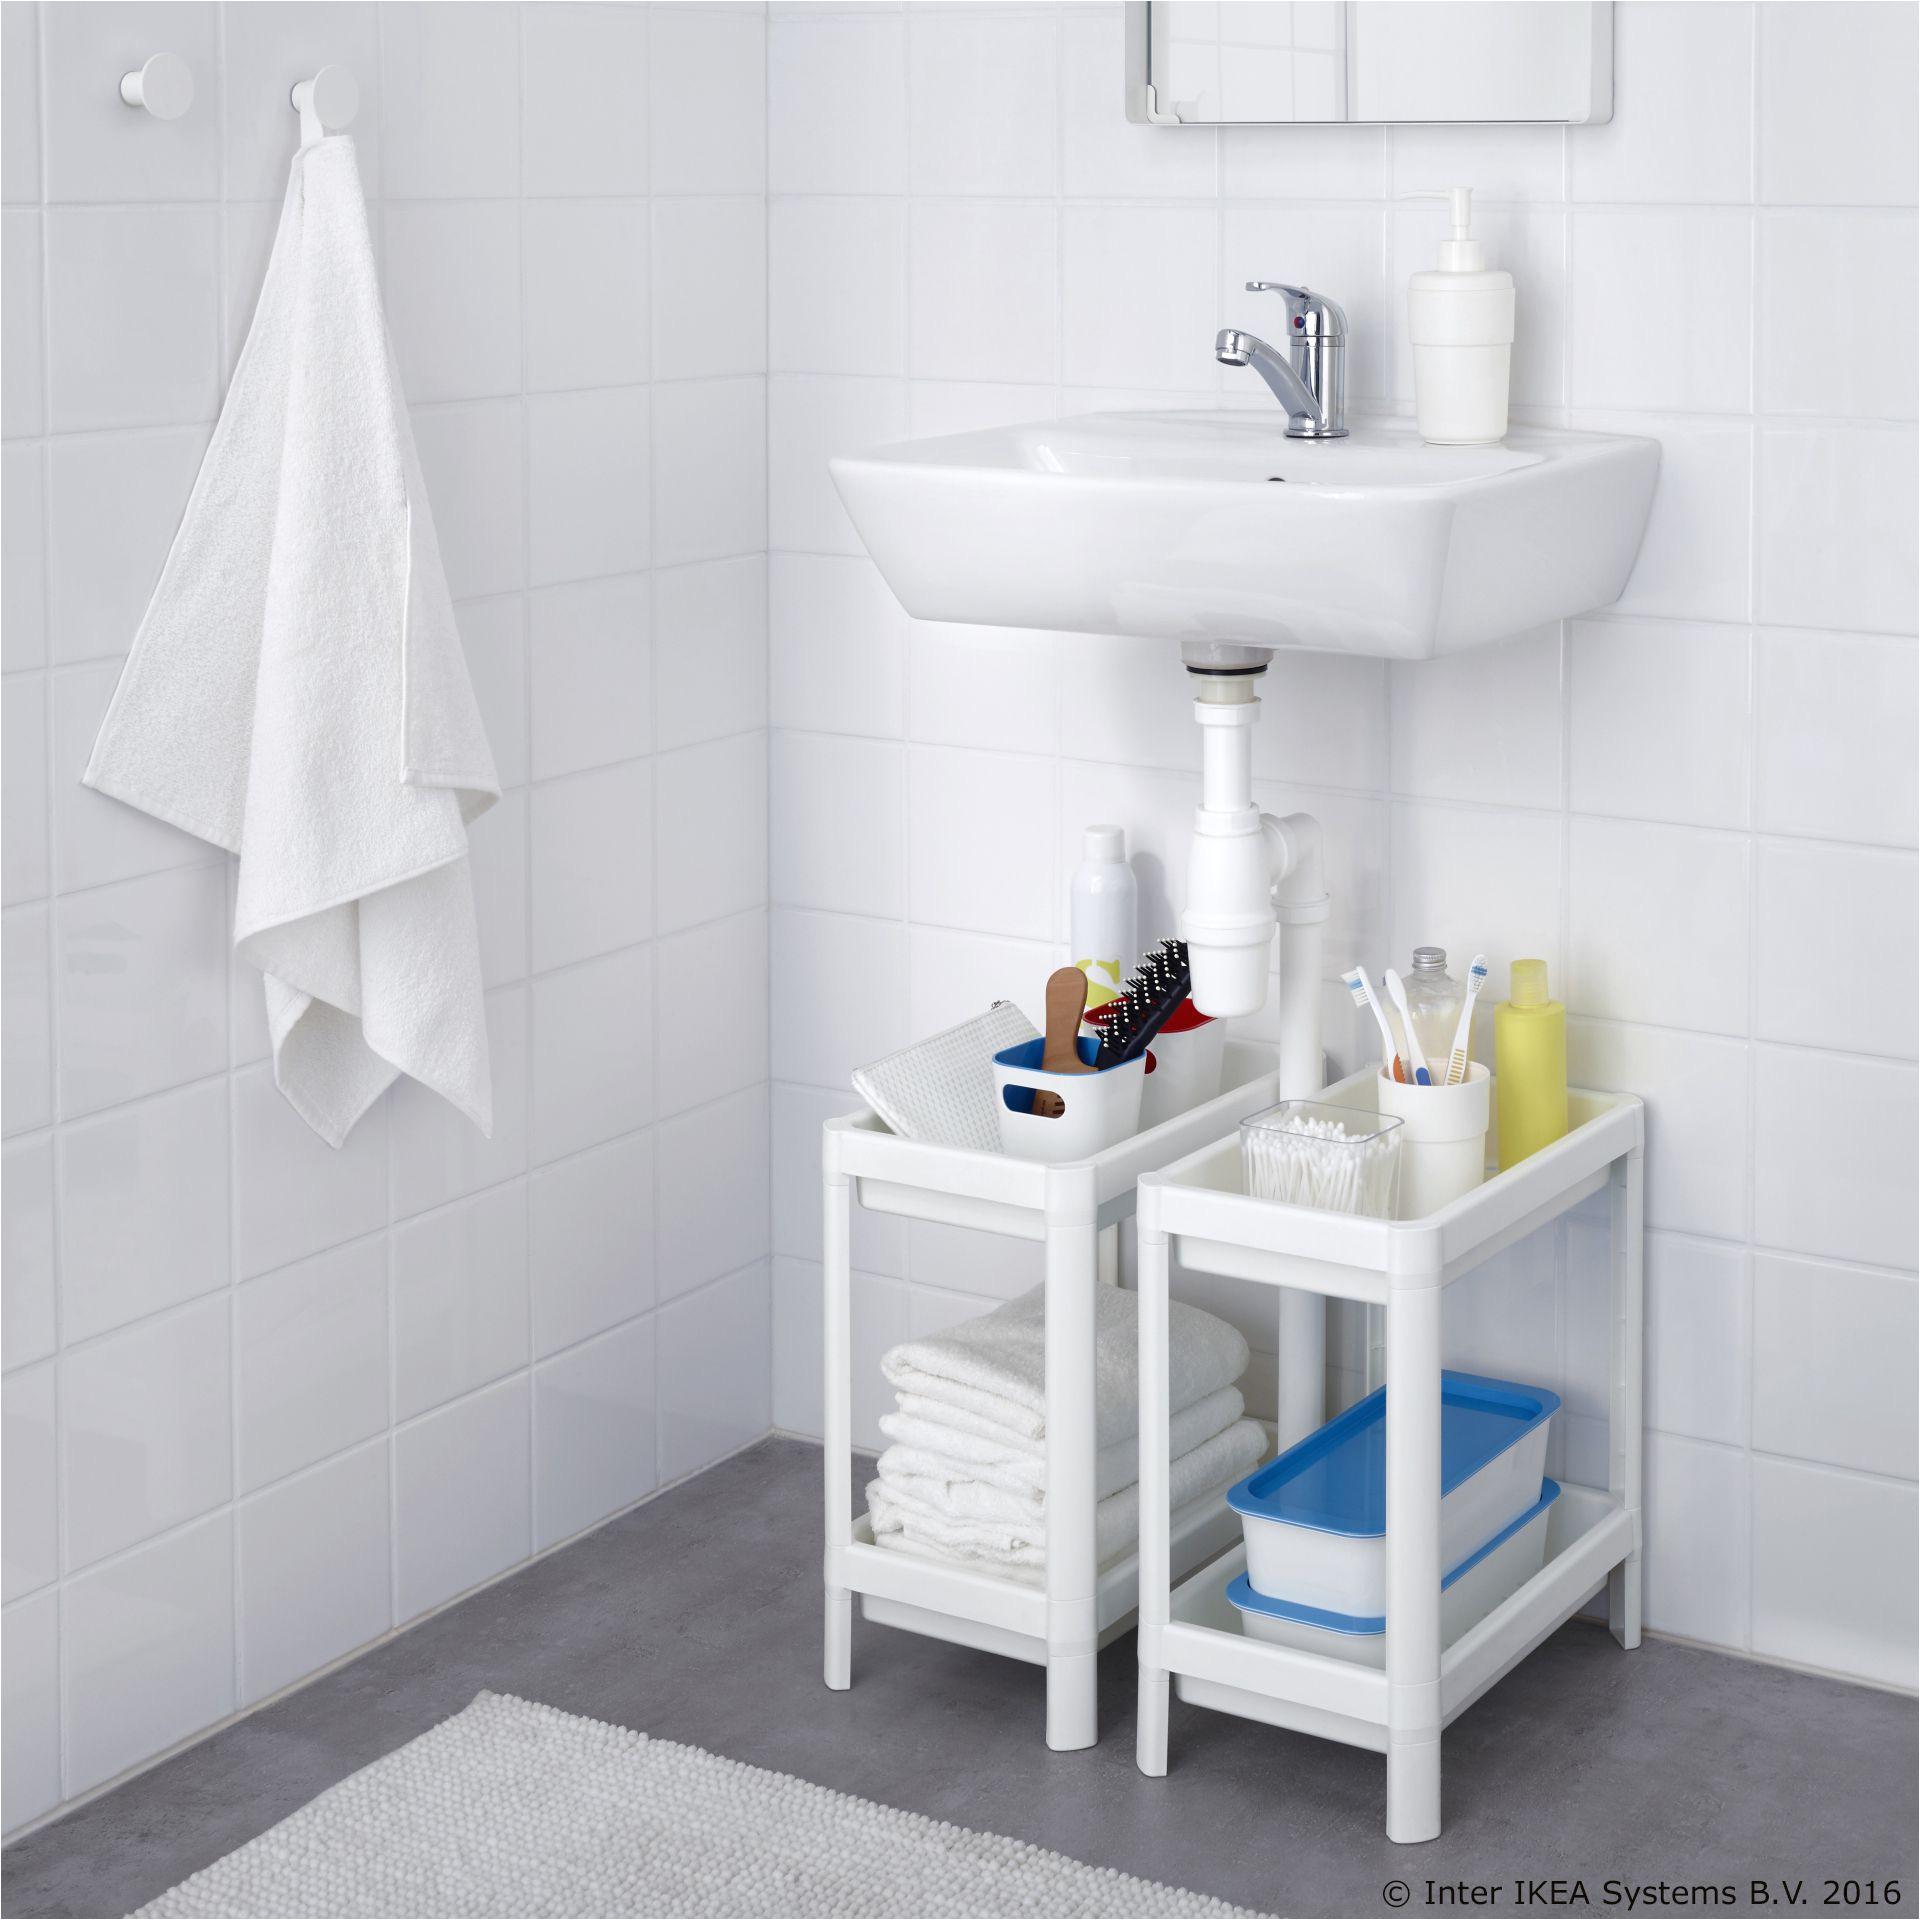 vesken regal izraa en od reciklirane plastike idealan je za male kupaonice a irina 23 cm dubina 36 cm visina 40 cm maks nosivost police 13 kg cijena